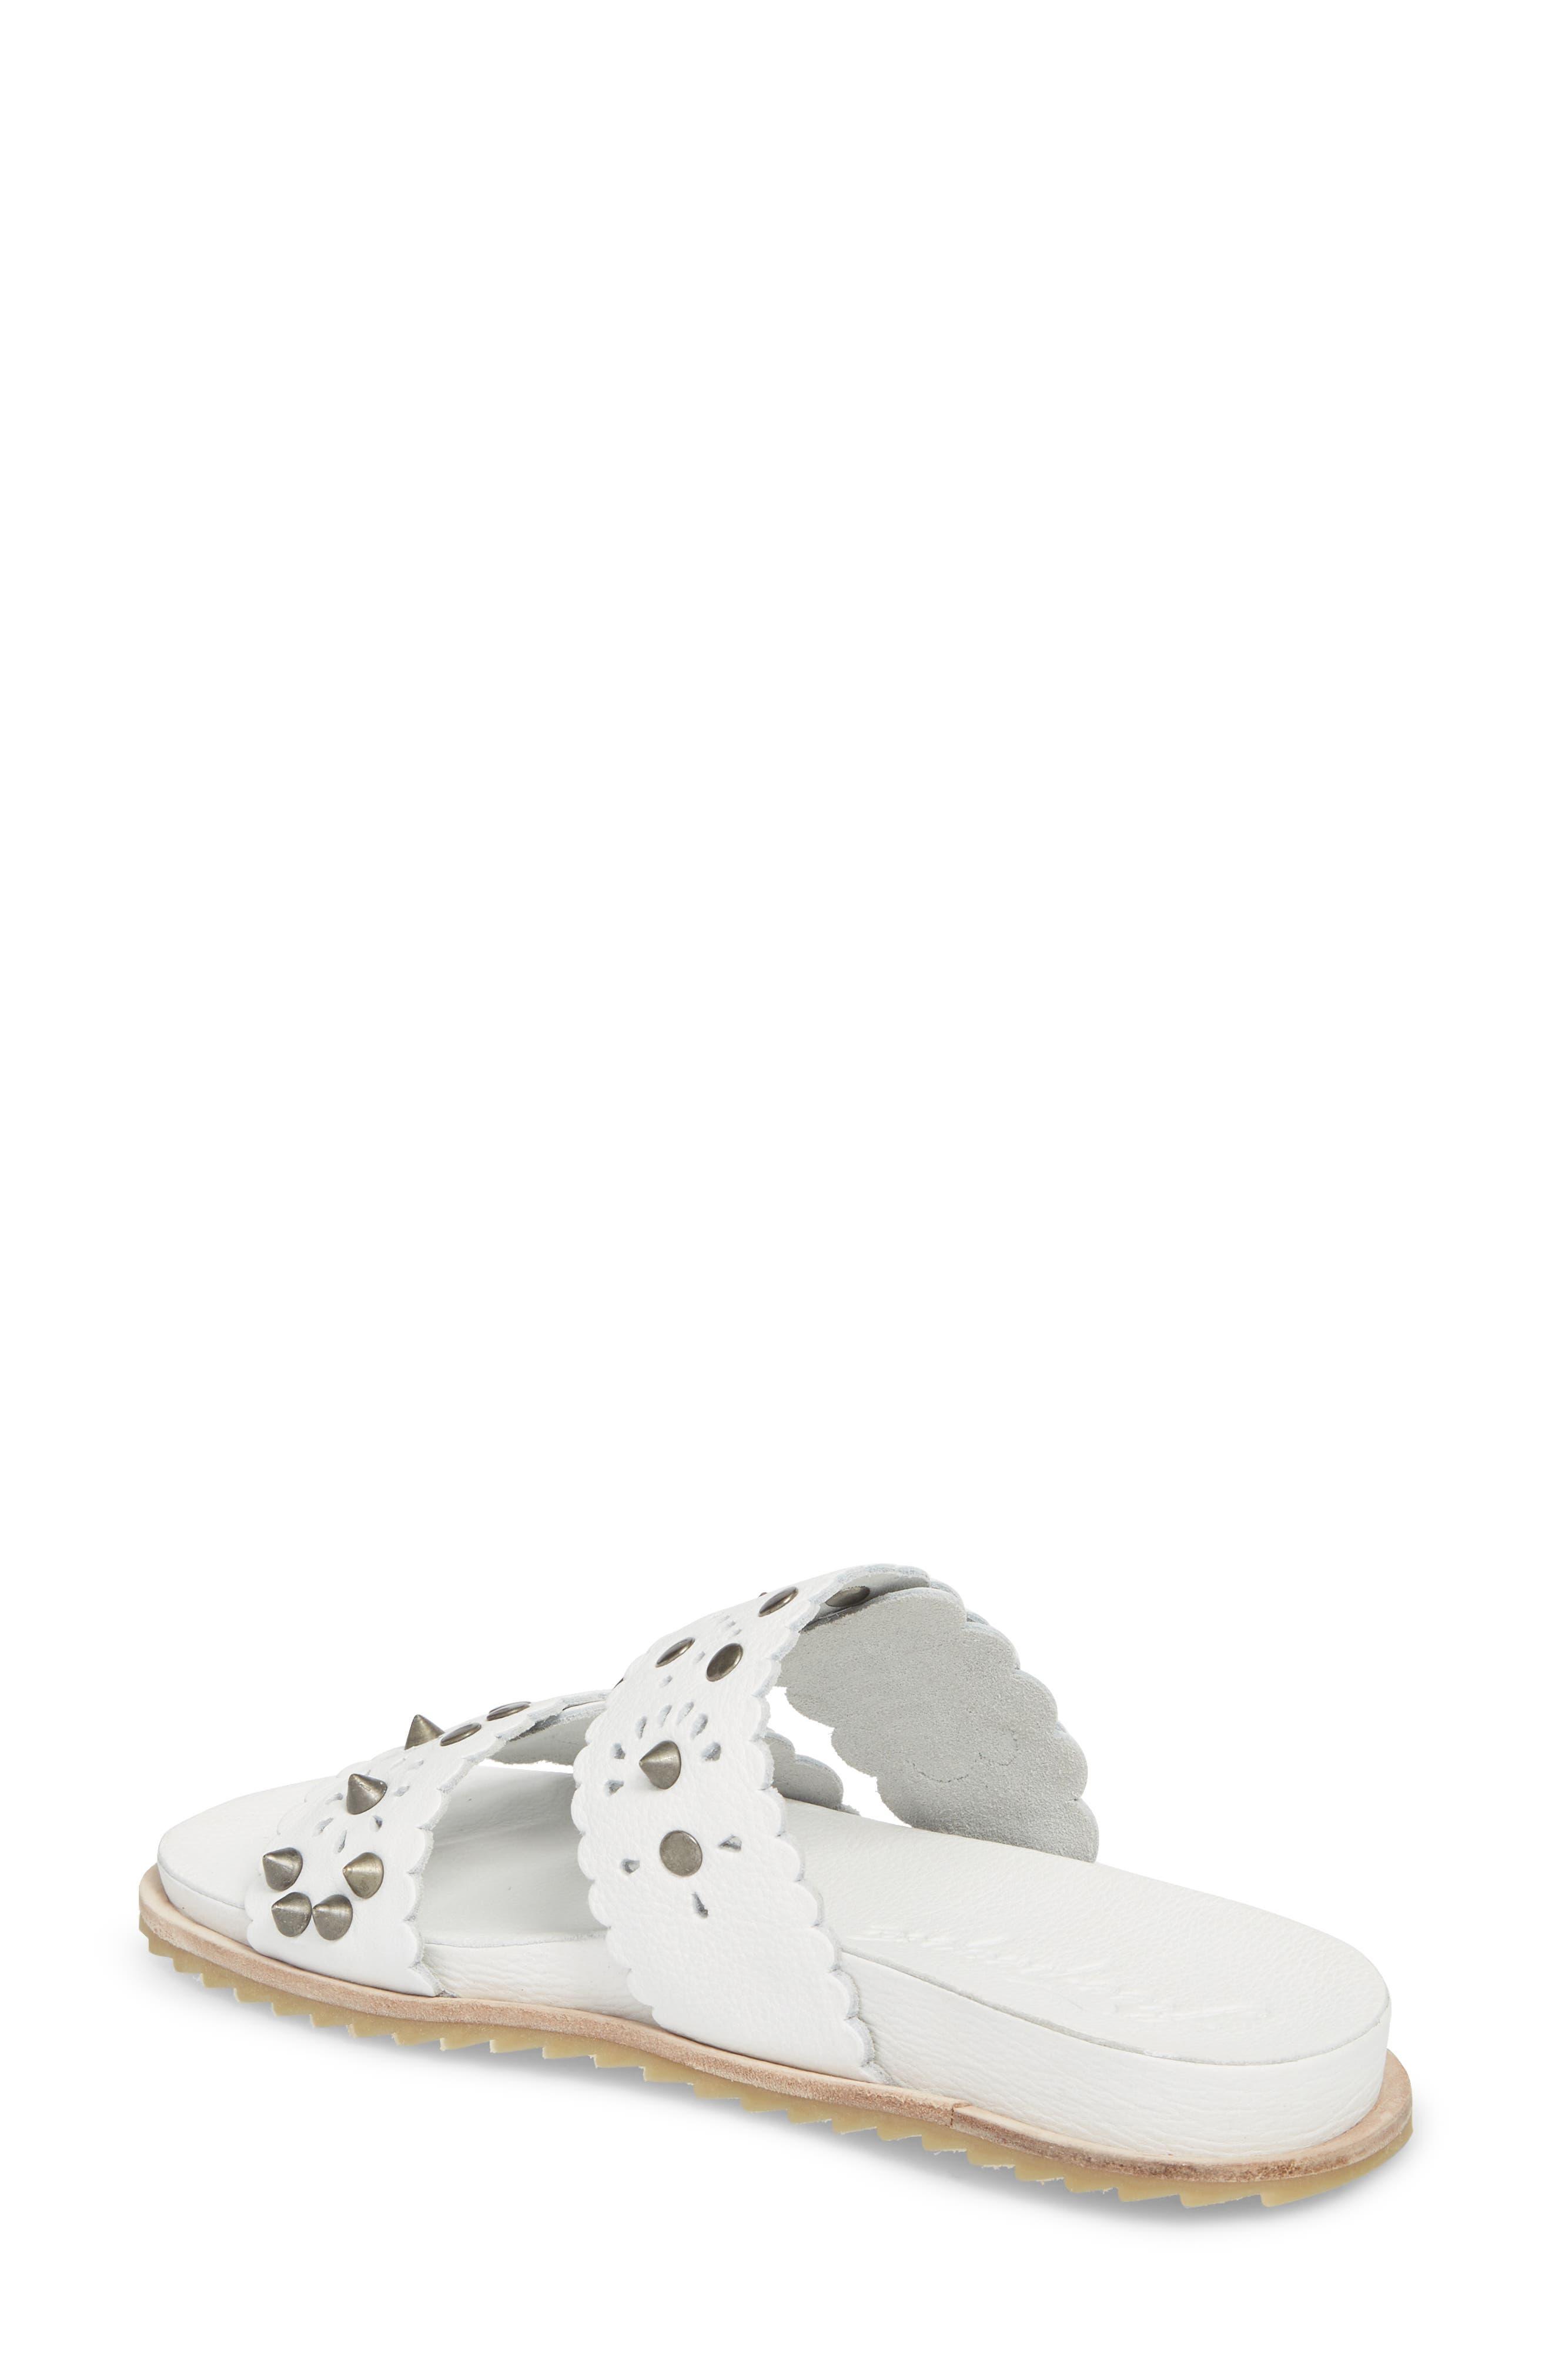 Spellbound Embellished Slide Sandal,                             Alternate thumbnail 2, color,                             White